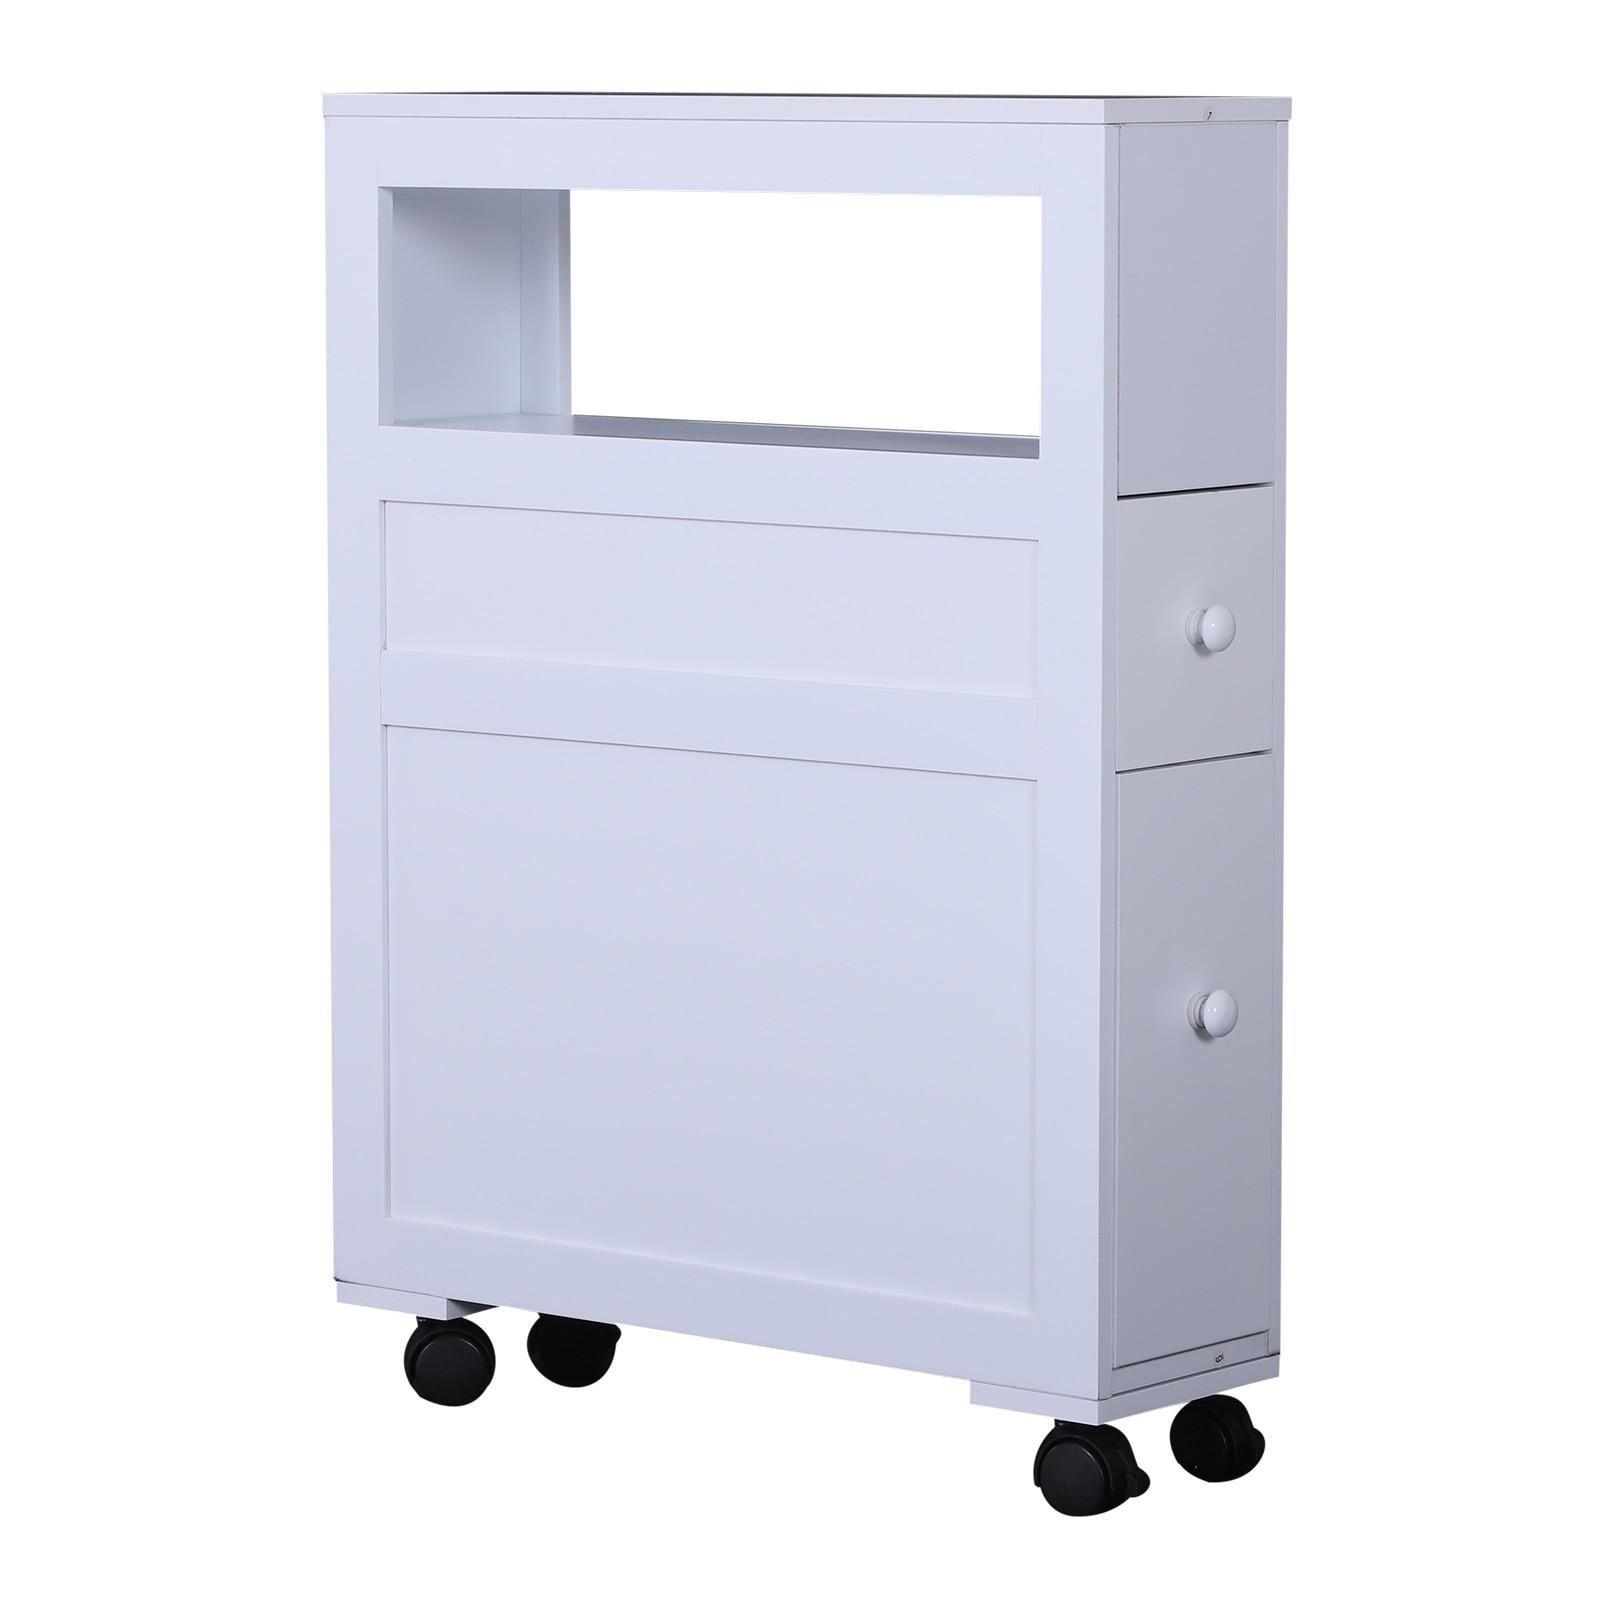 HOMCOM Cabinet Bathroom 2 Drawer Space Saving With 4 Wheels Wood 16x52x66 Cm White